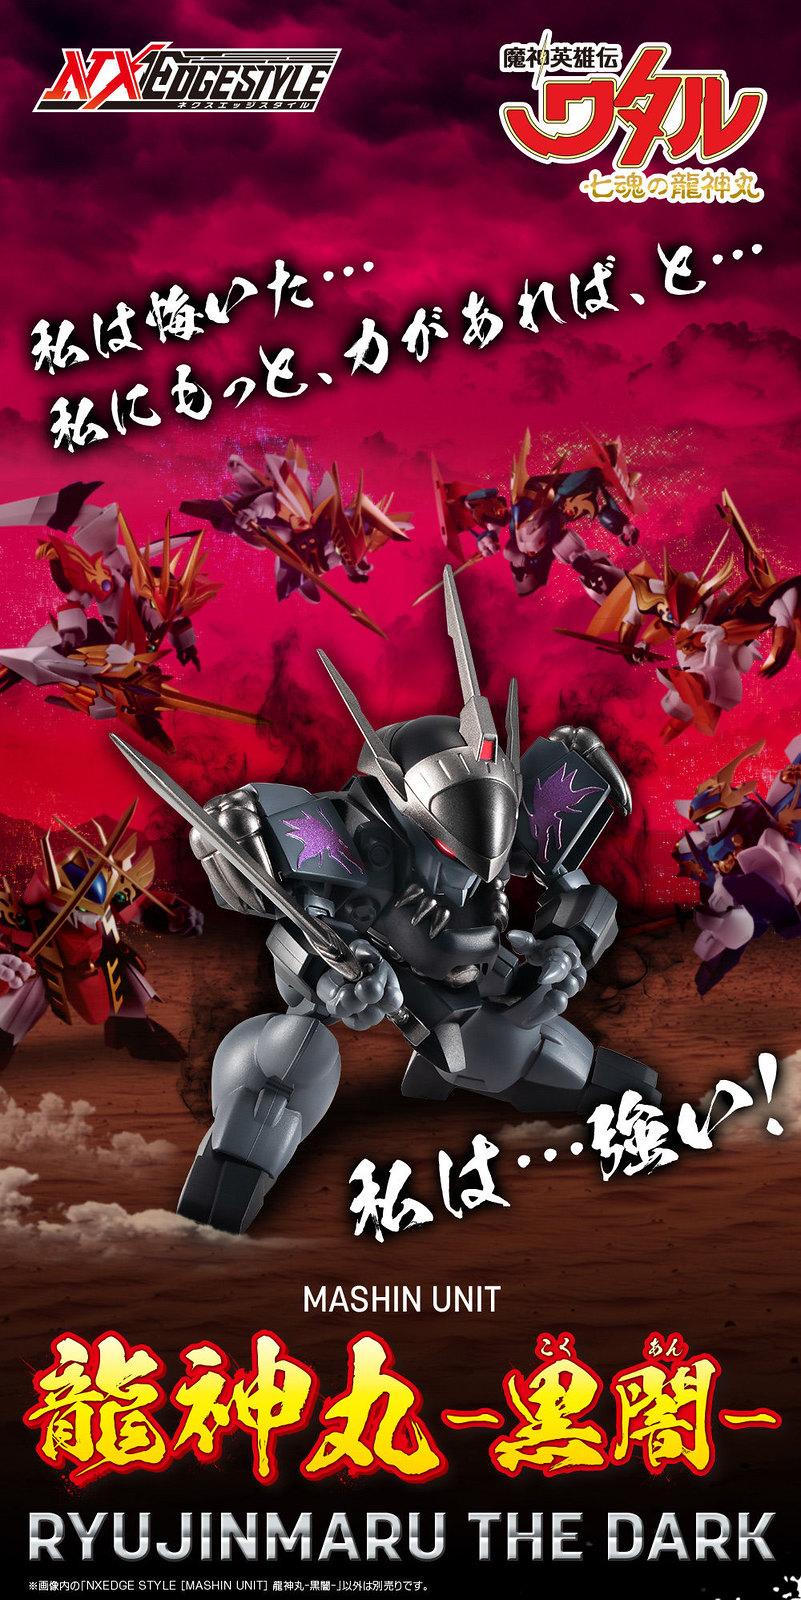 NXEDGE STYLE《魔神英雄傳 七魂的龍神丸》龍神丸-黑闇-  遭到侵蝕的黑暗姿態明年 05 月推出!